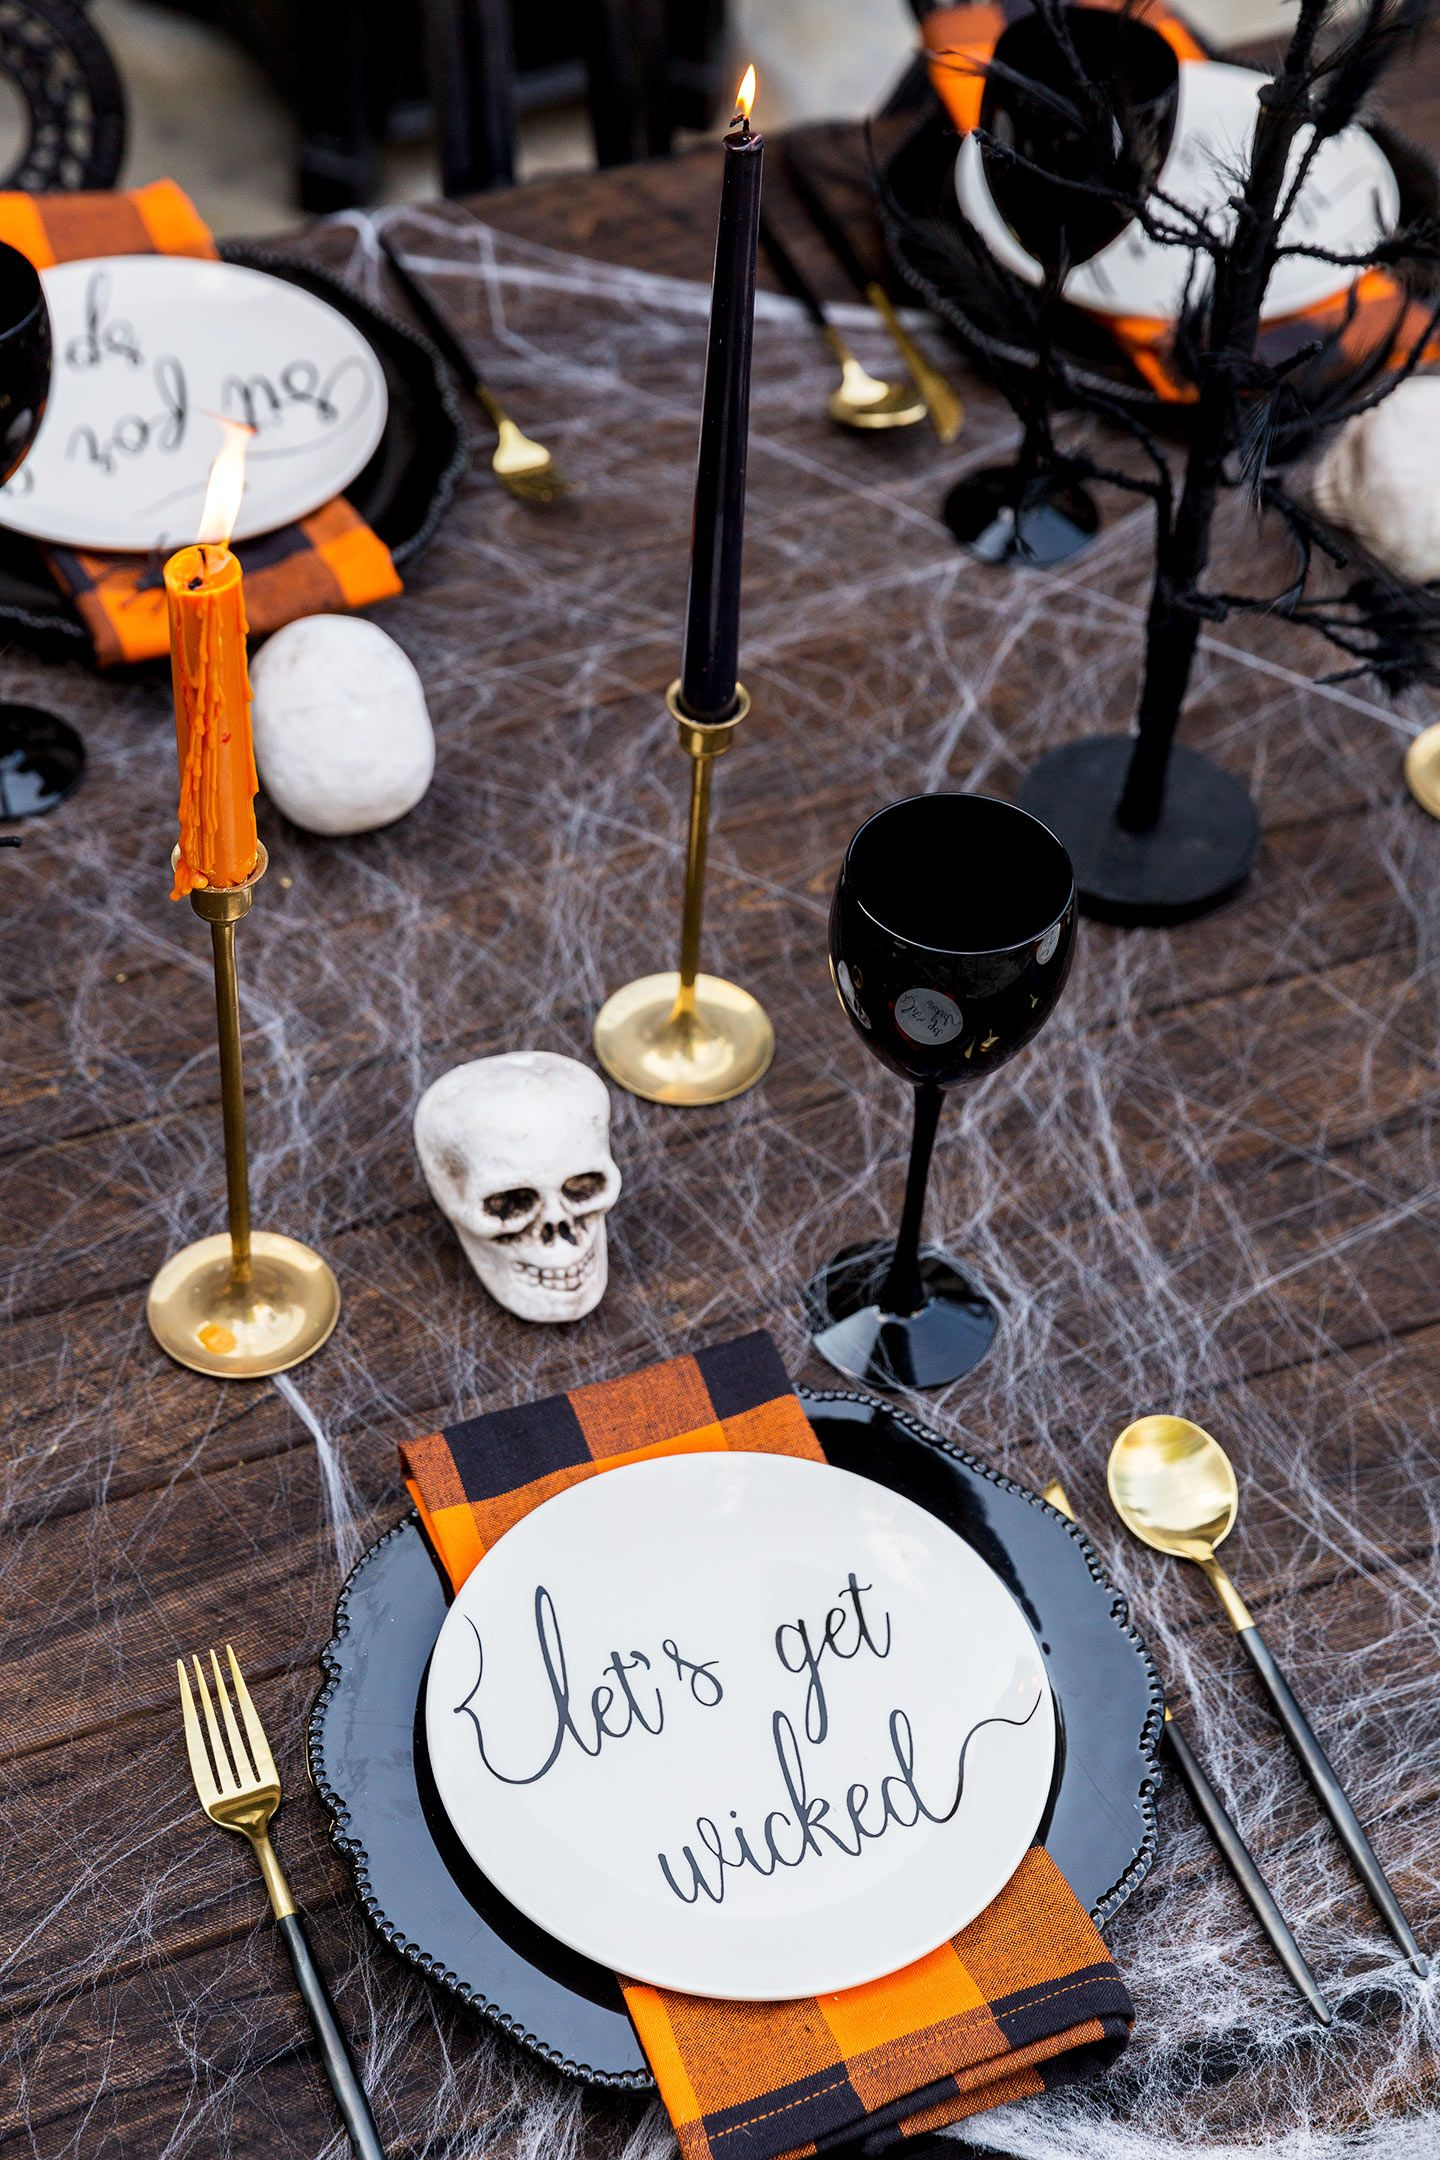 Halloween Dinner Party Menu Ideas Part - 35: Adult Halloween Party Decorations U0026 Halloween Menu Ideas